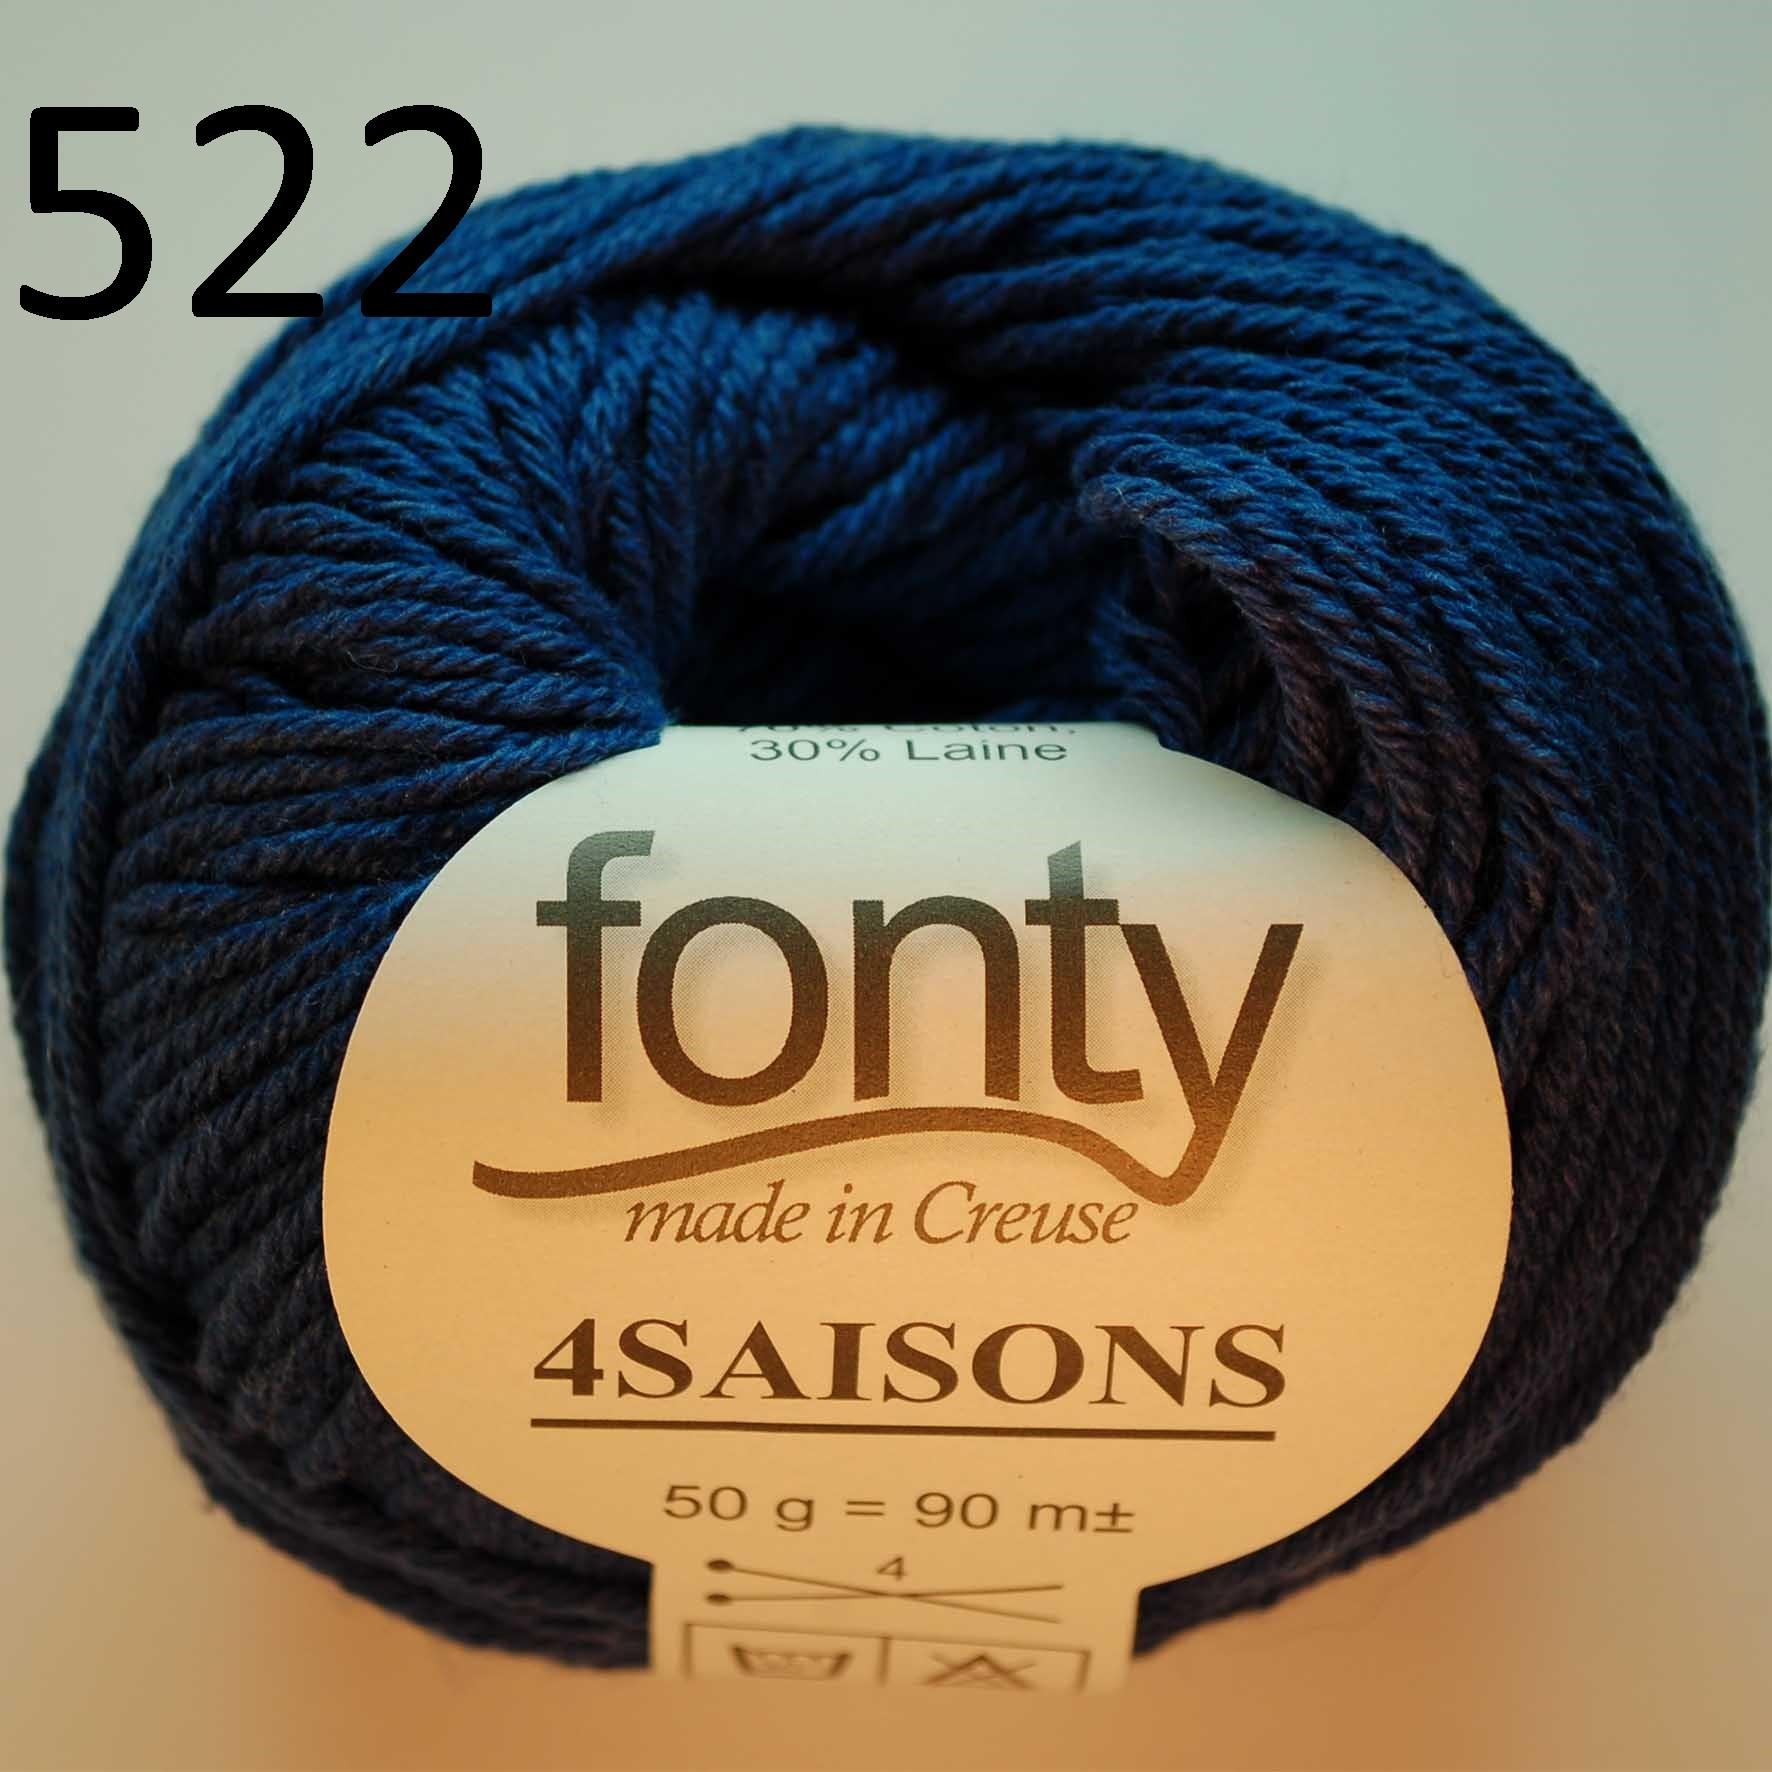 4 Saisons 522